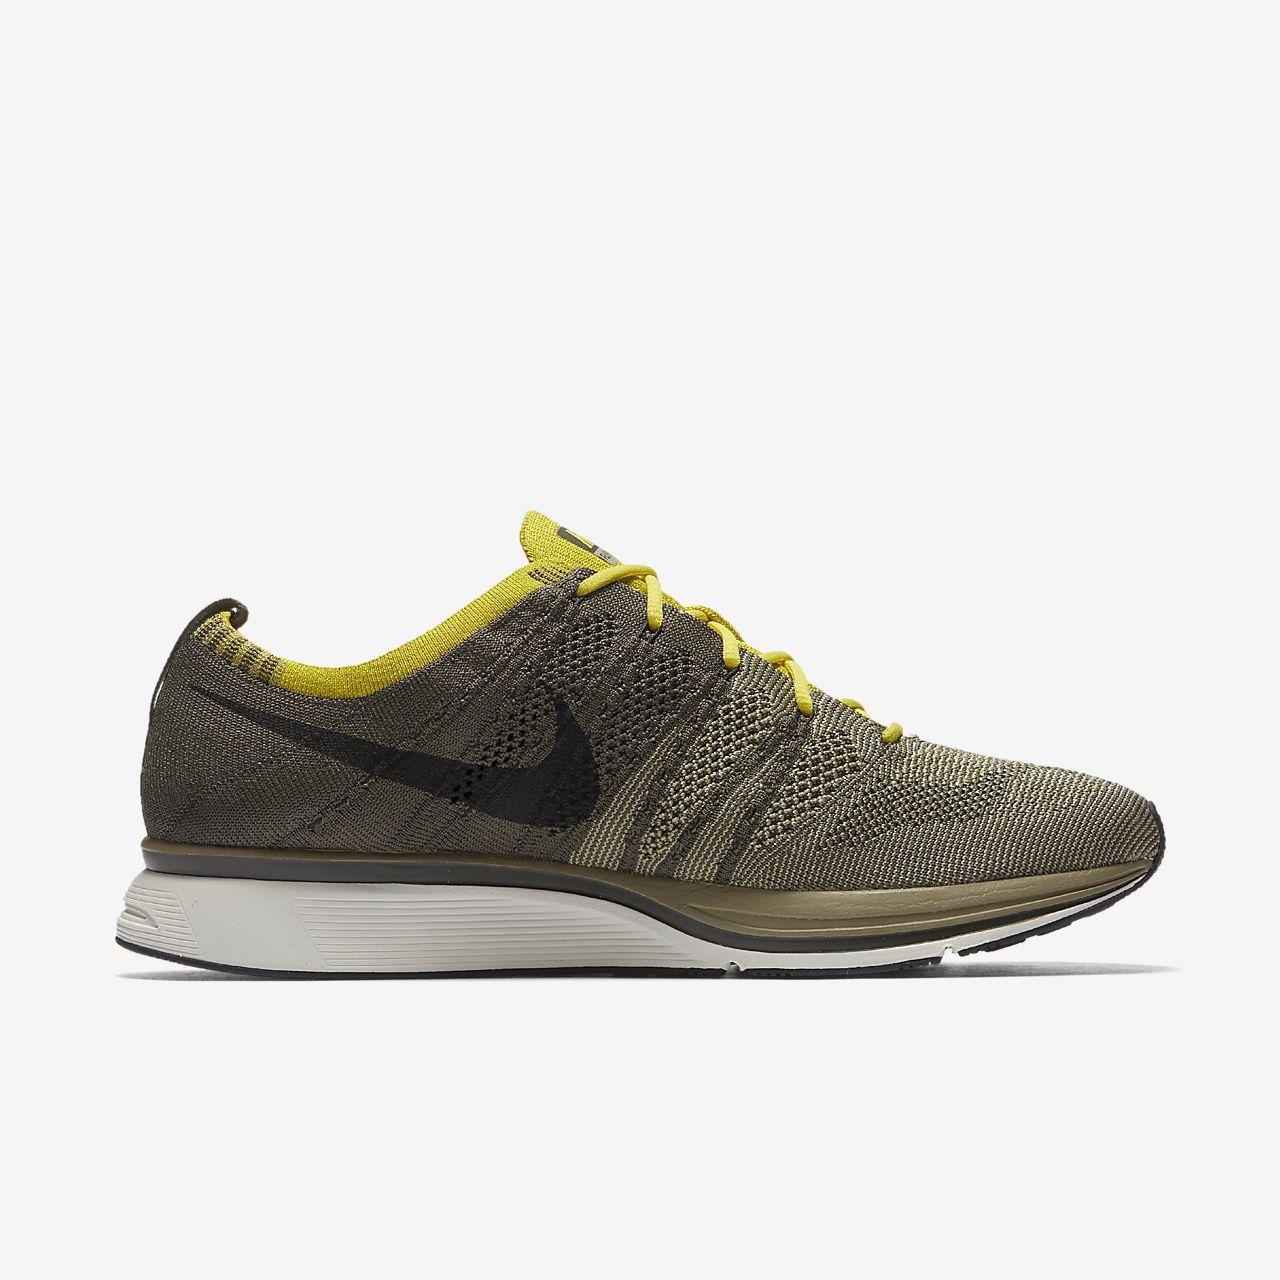 d00b038c1f8b4 Nike Flyknit Trainer Unisex Shoe. Nike.com NL